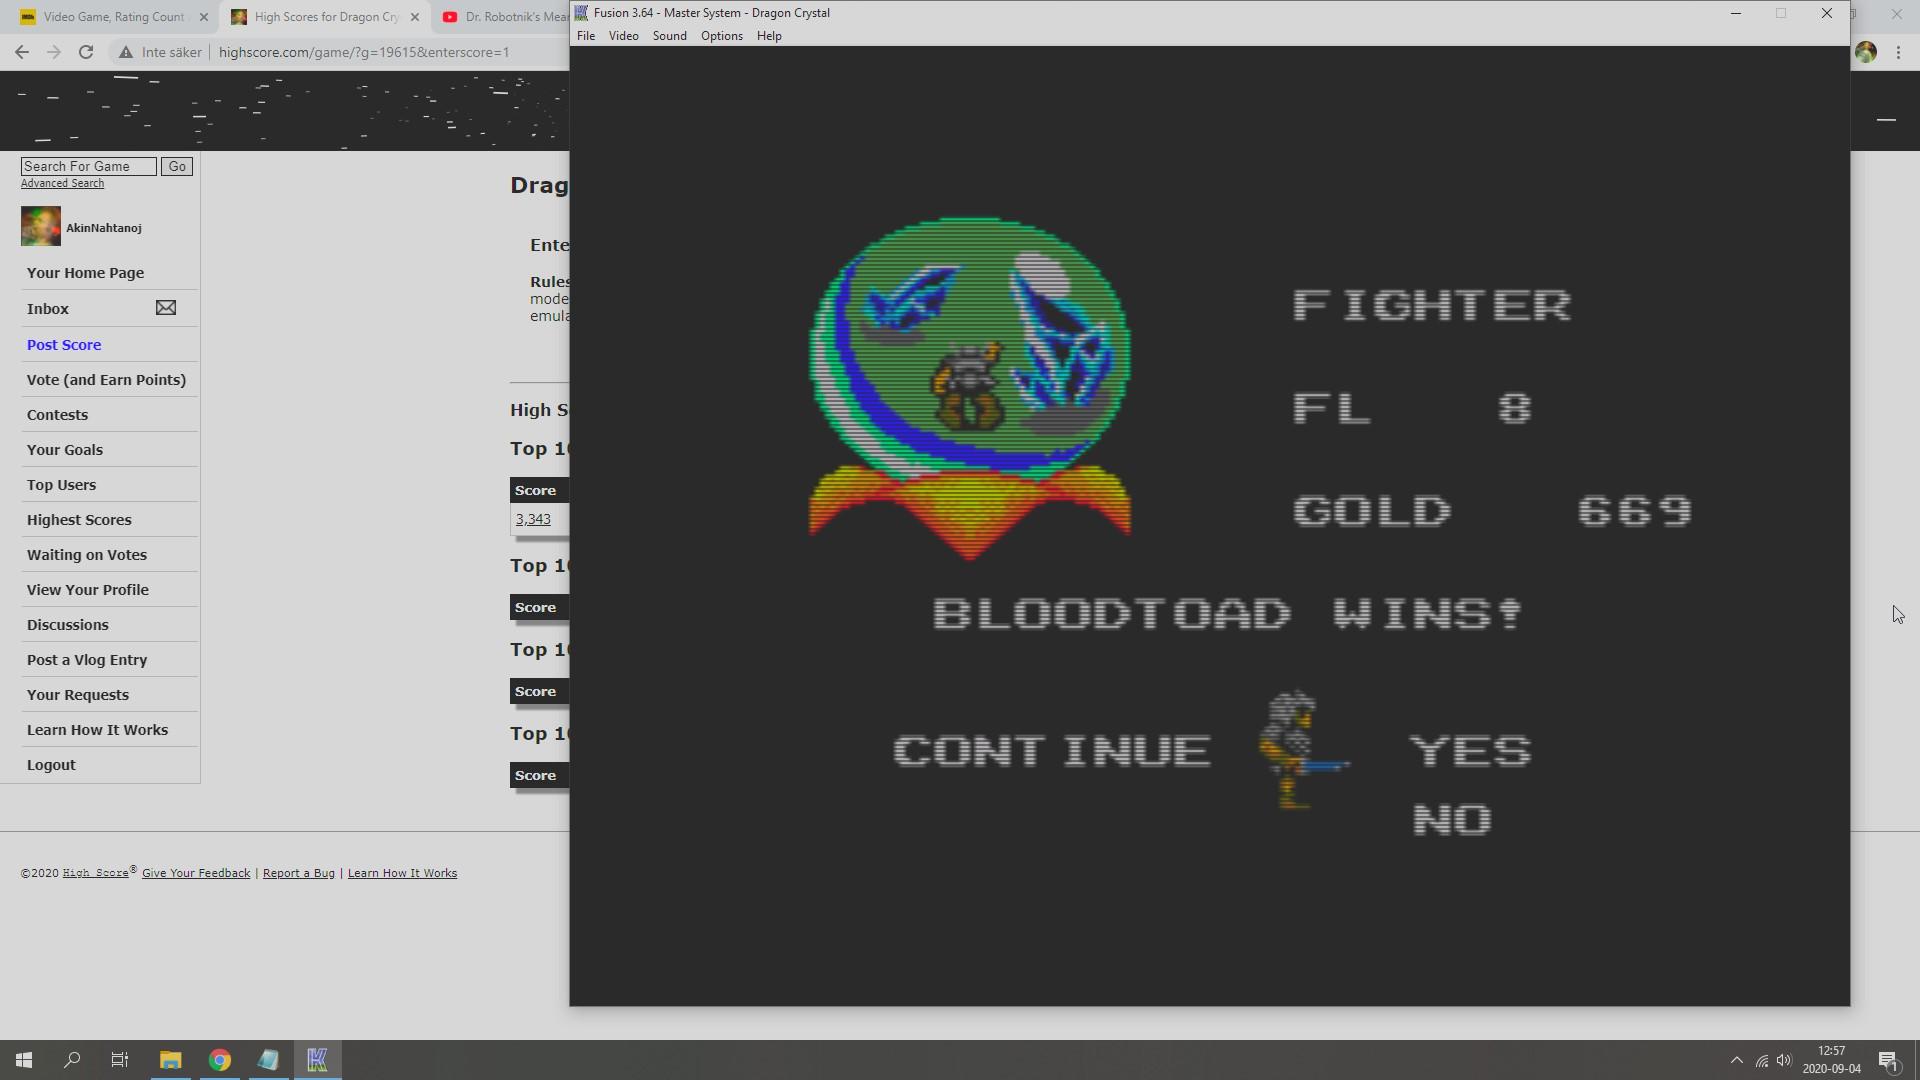 AkinNahtanoj: Dragon Crystal (Sega Master System Emulated) 669 points on 2020-09-04 06:33:25